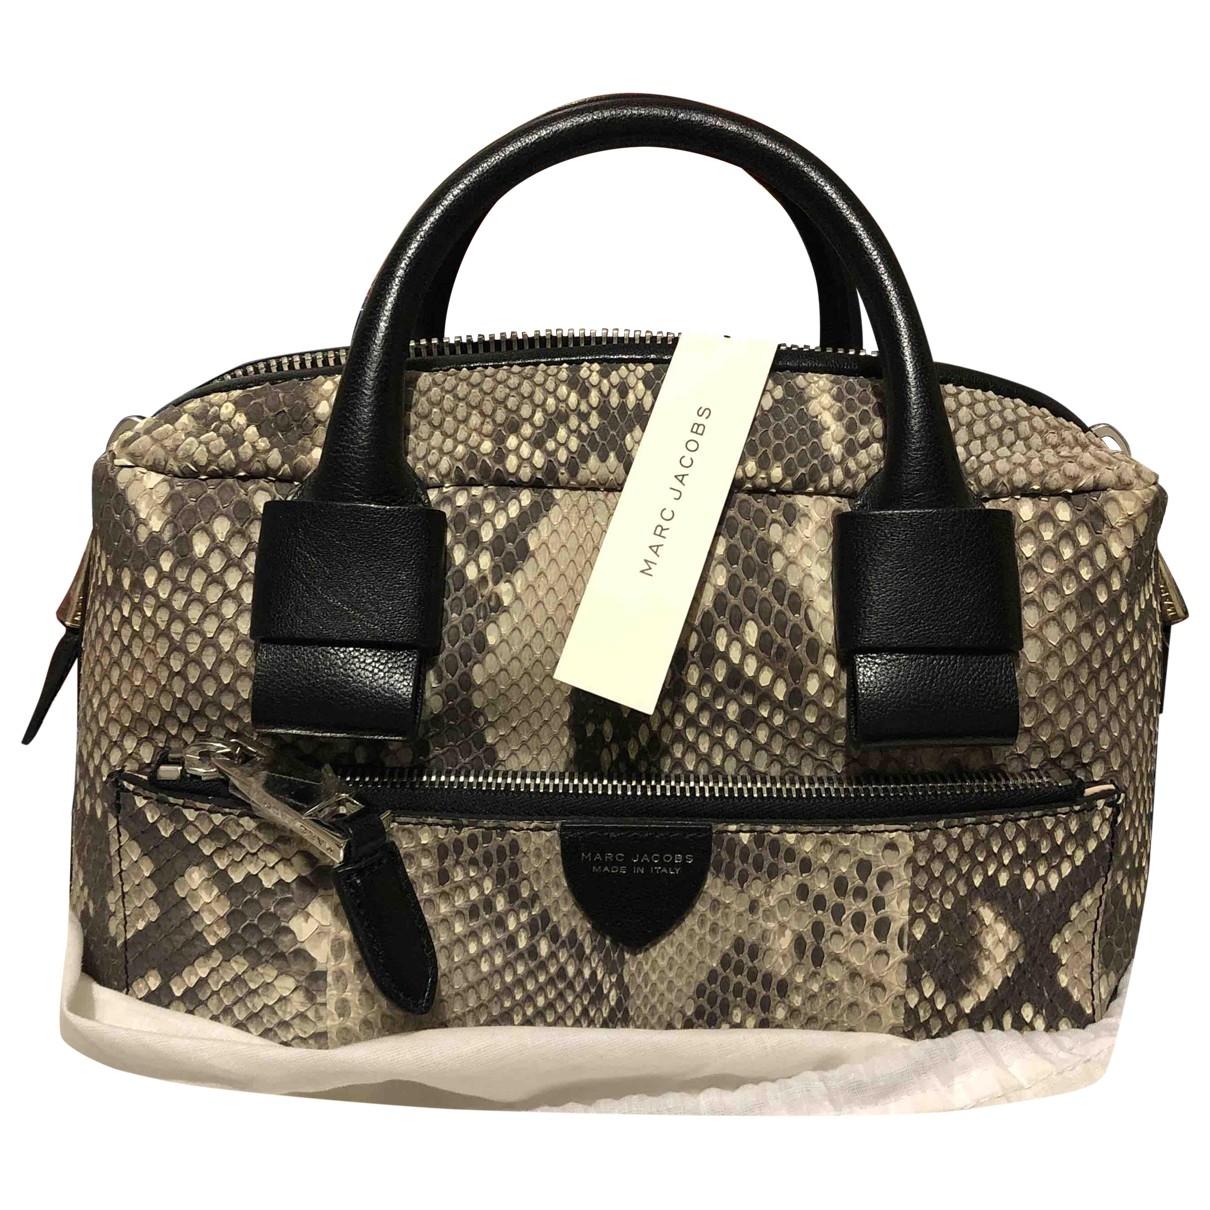 Marc Jacobs The Box Bag Handtasche in  Bunt Python